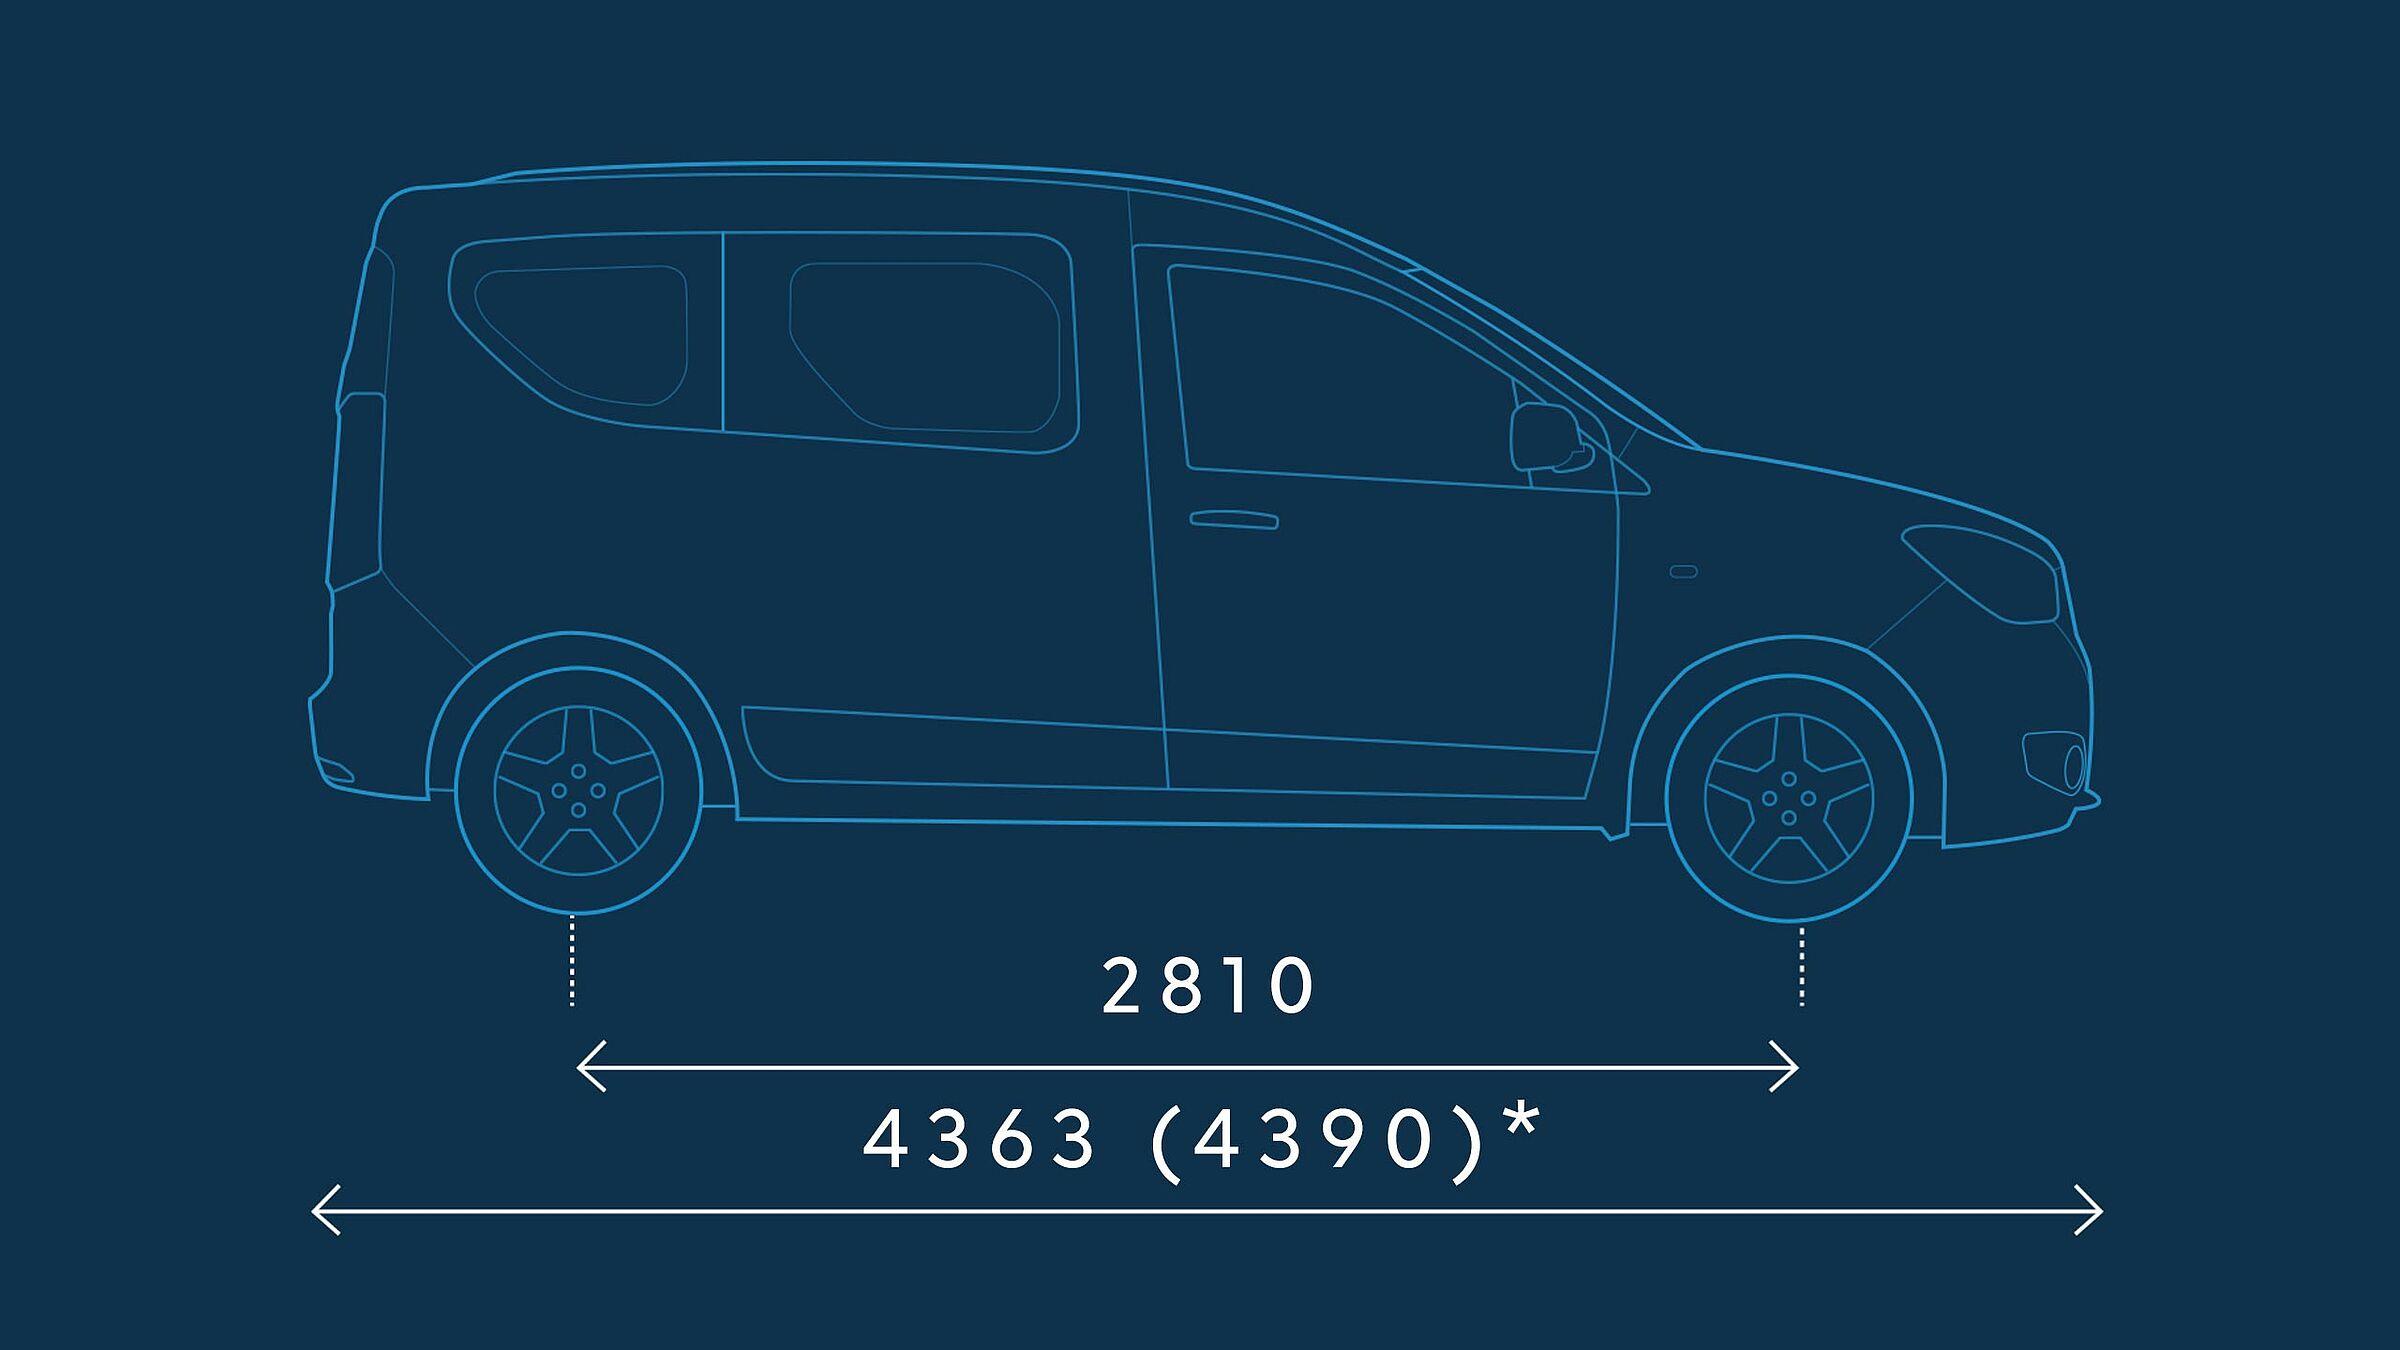 Dacia Dokker Autozentren P&A-Preckel